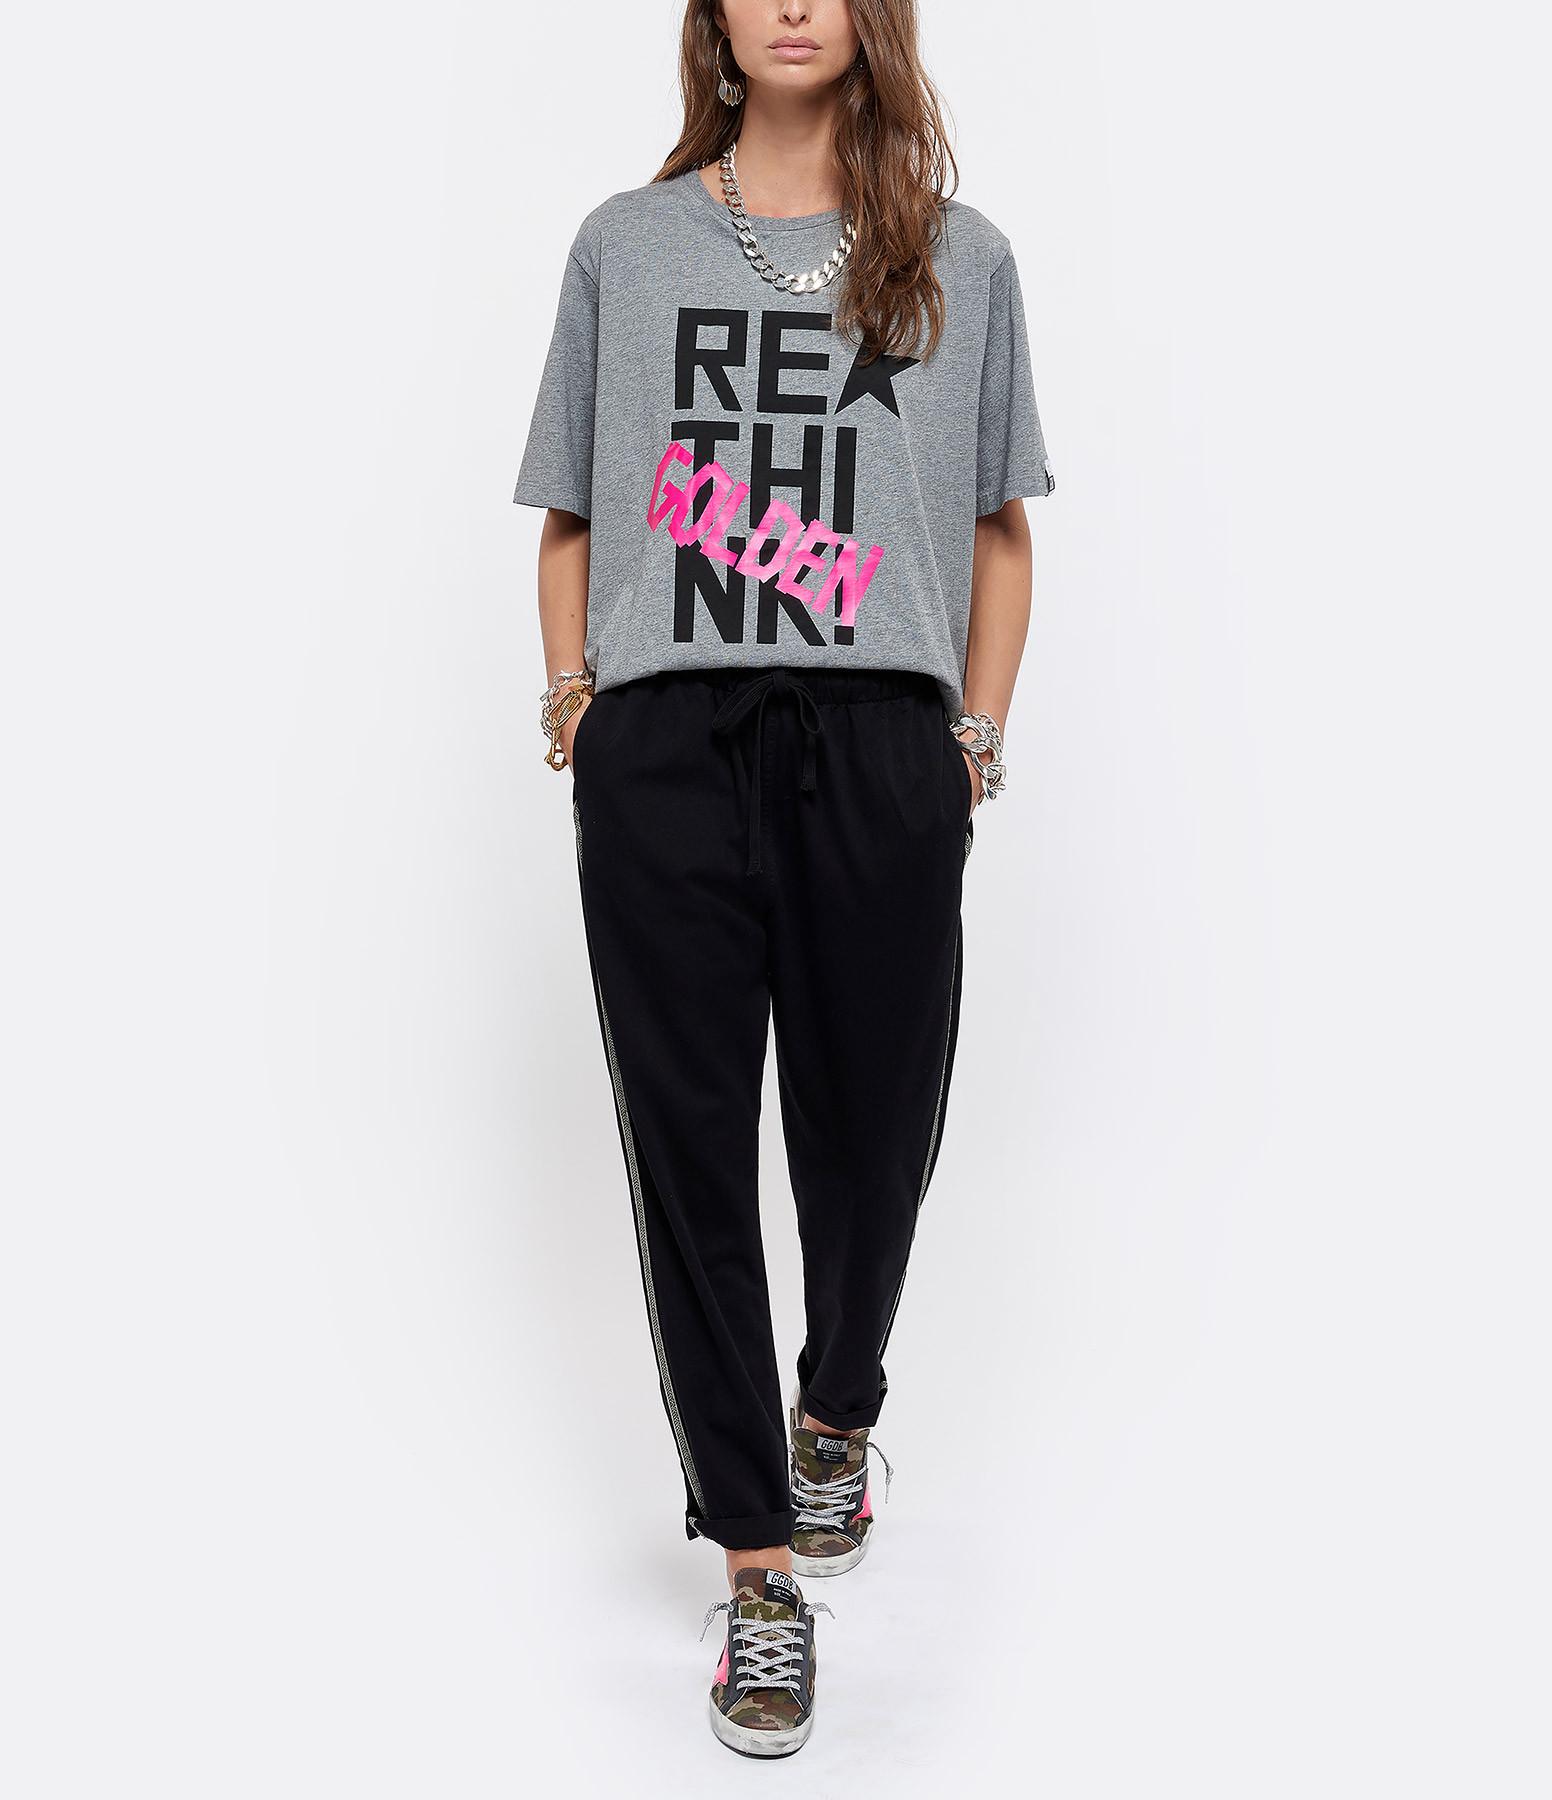 XIRENA - Pantalon Rex Coton Noir